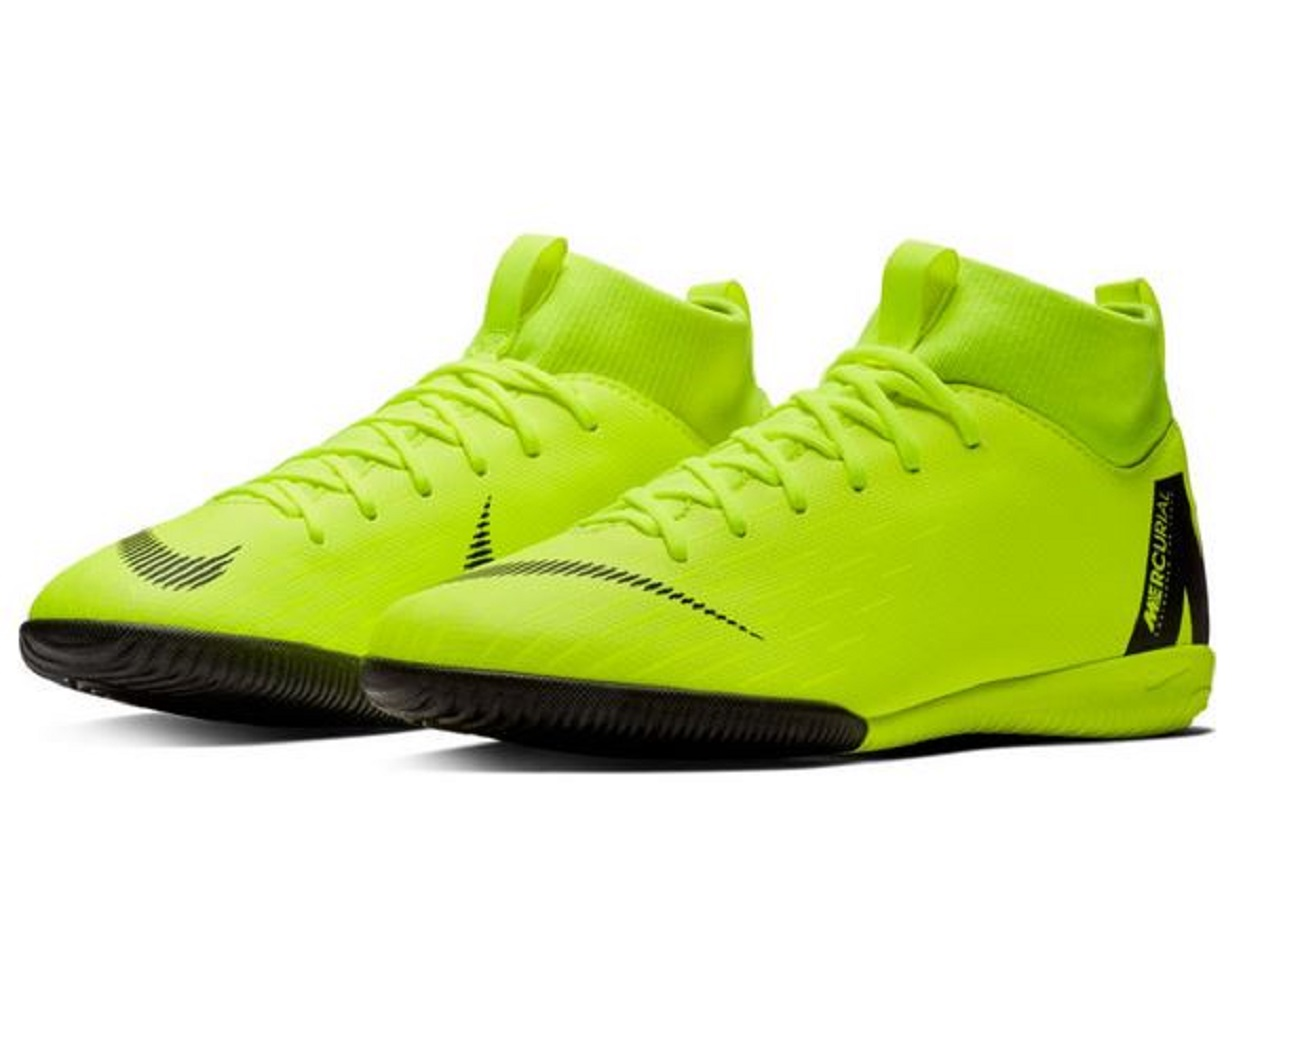 Nike Superfly 6 Academy Gs Ic Hallenschuh Kinder Neongelb Schwarz